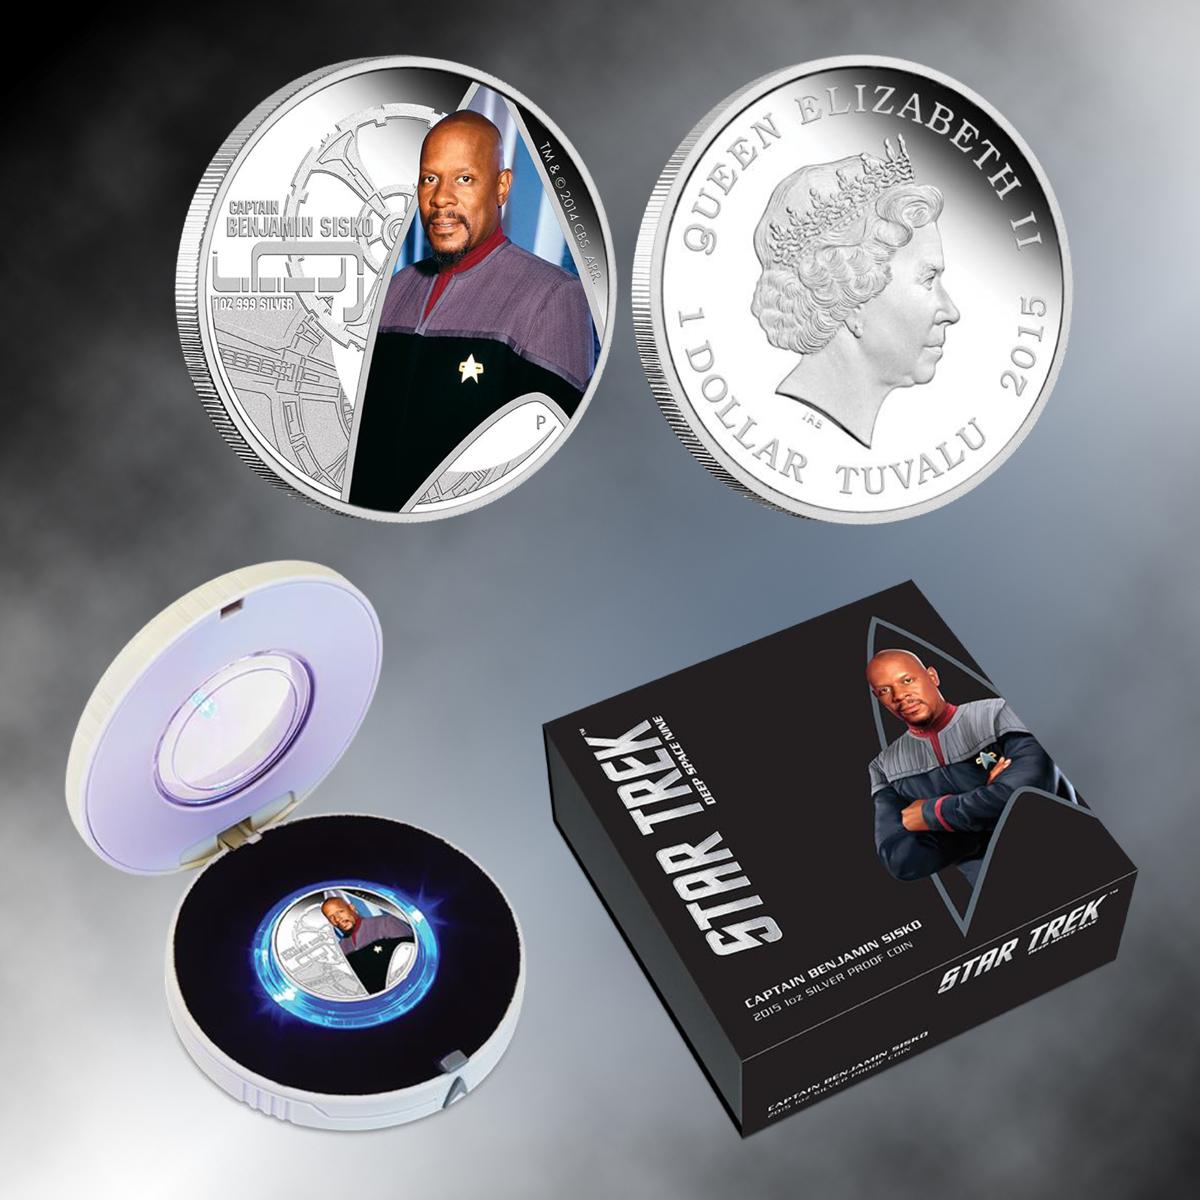 2015 Star Trek: Deep Space Nine - Captain Benjamin Sisko 1oz Silver Proof Coin